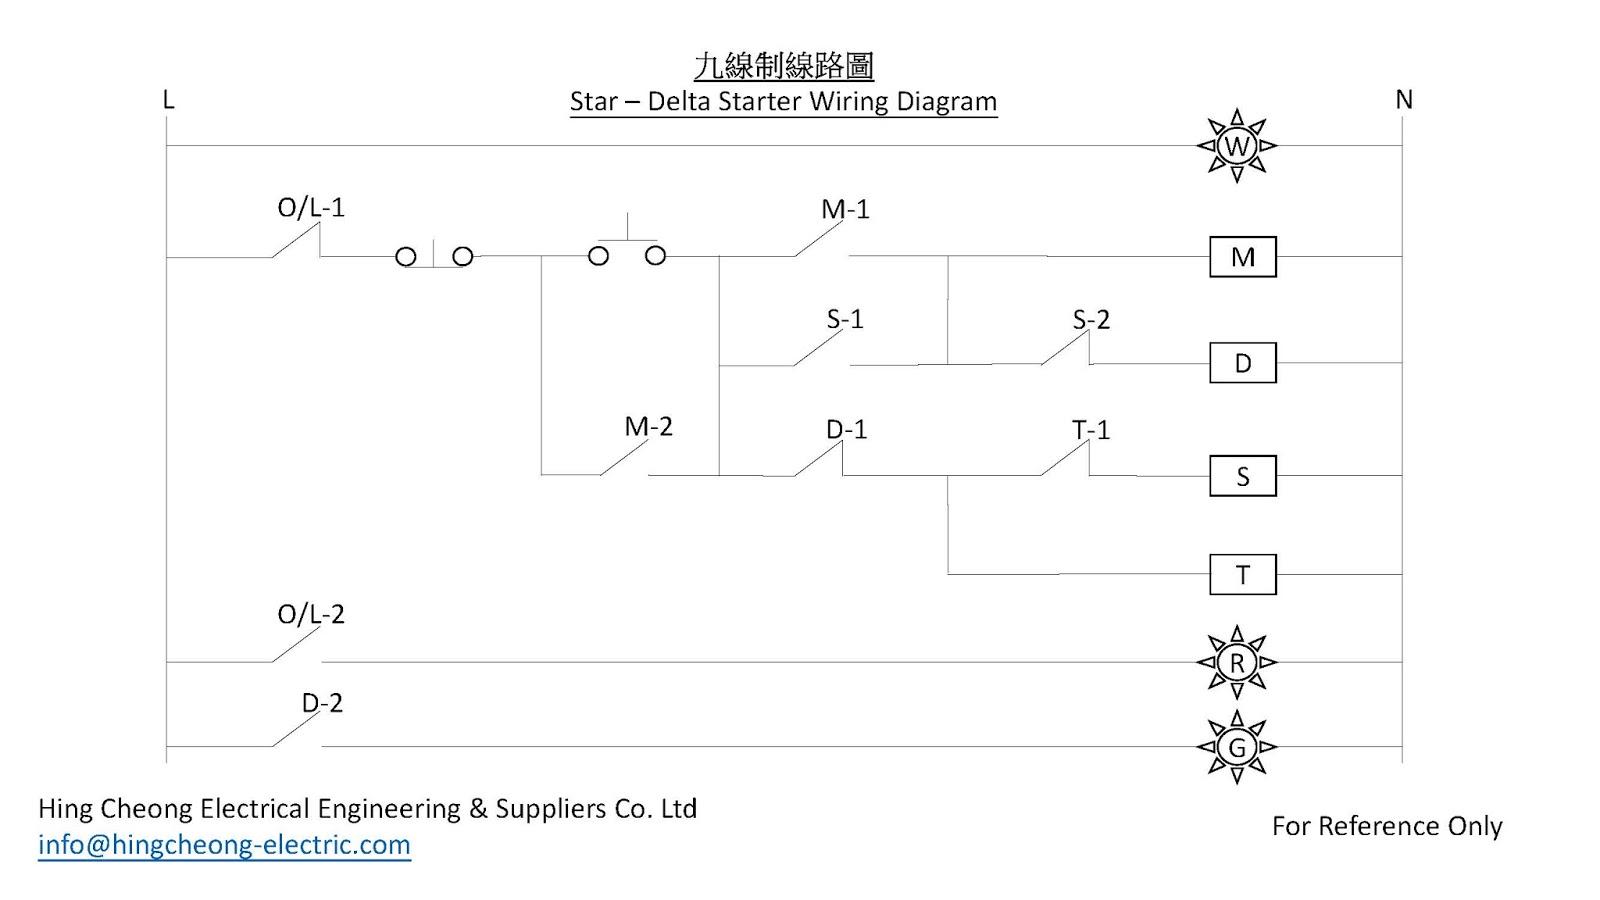 star delta motor starter wiring diagram  [ 1600 x 900 Pixel ]